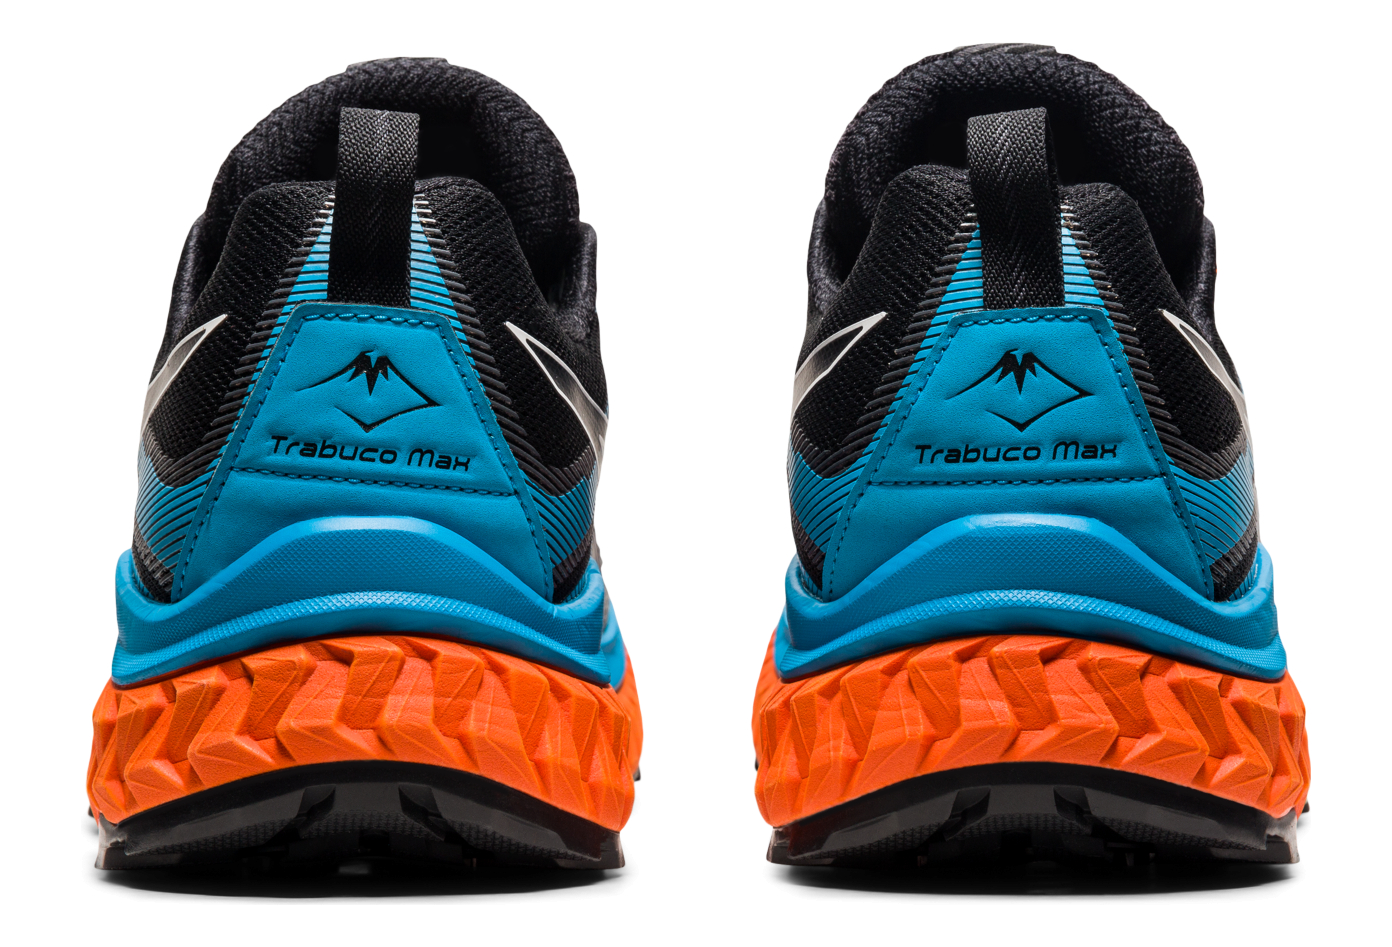 Asics Trabuco Max Trail Shoes Black Blue Orange